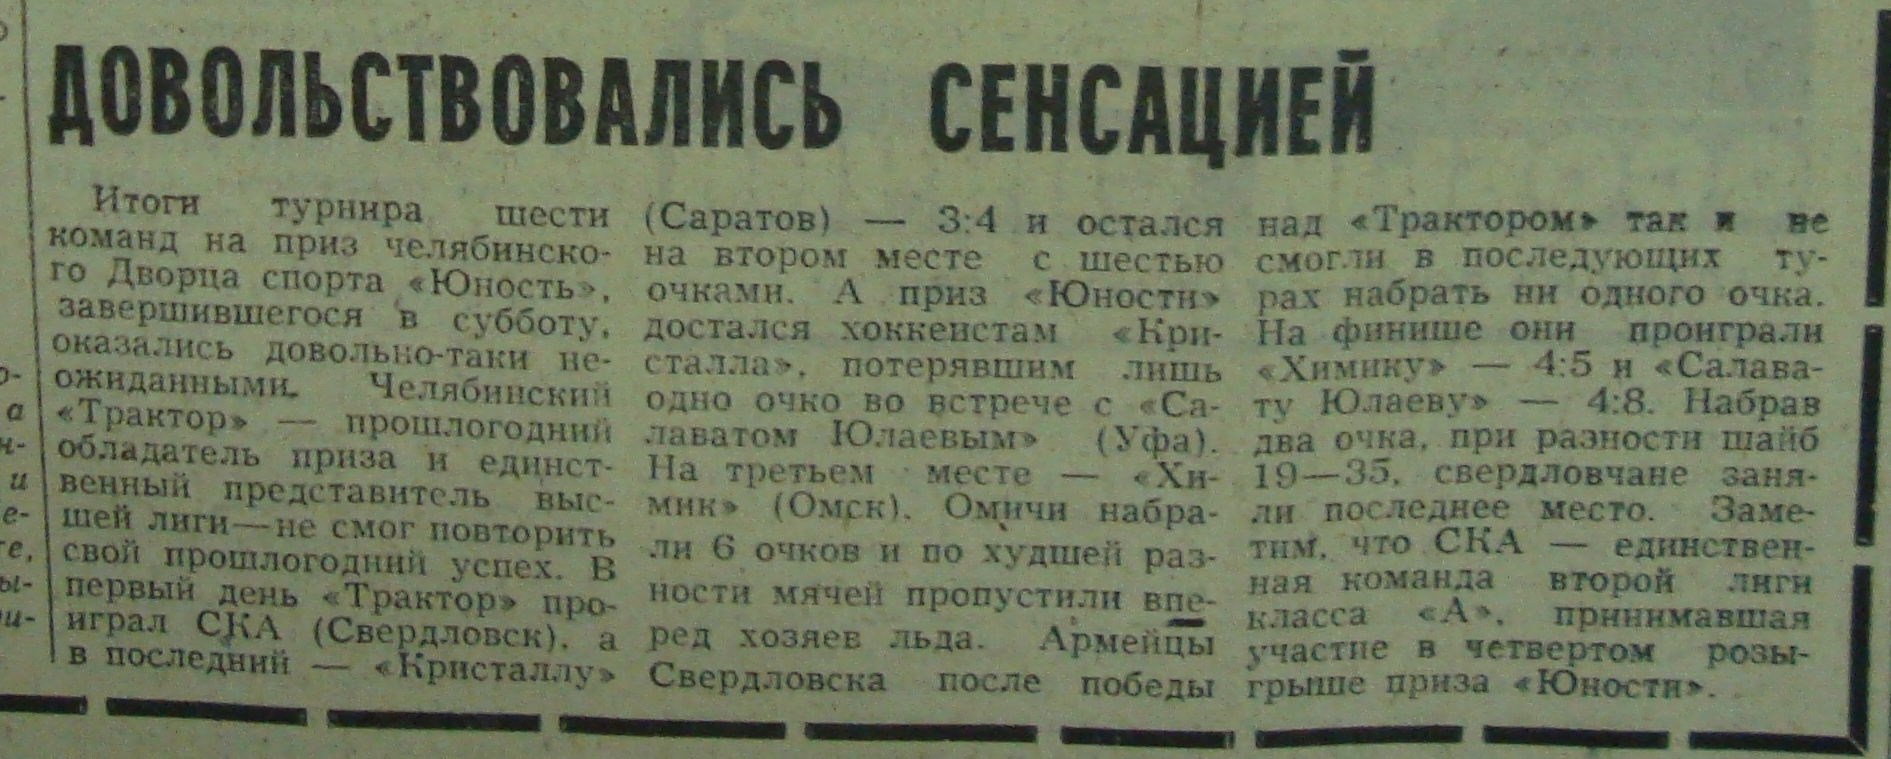 челябинск-2 - турнир 1973.JPG